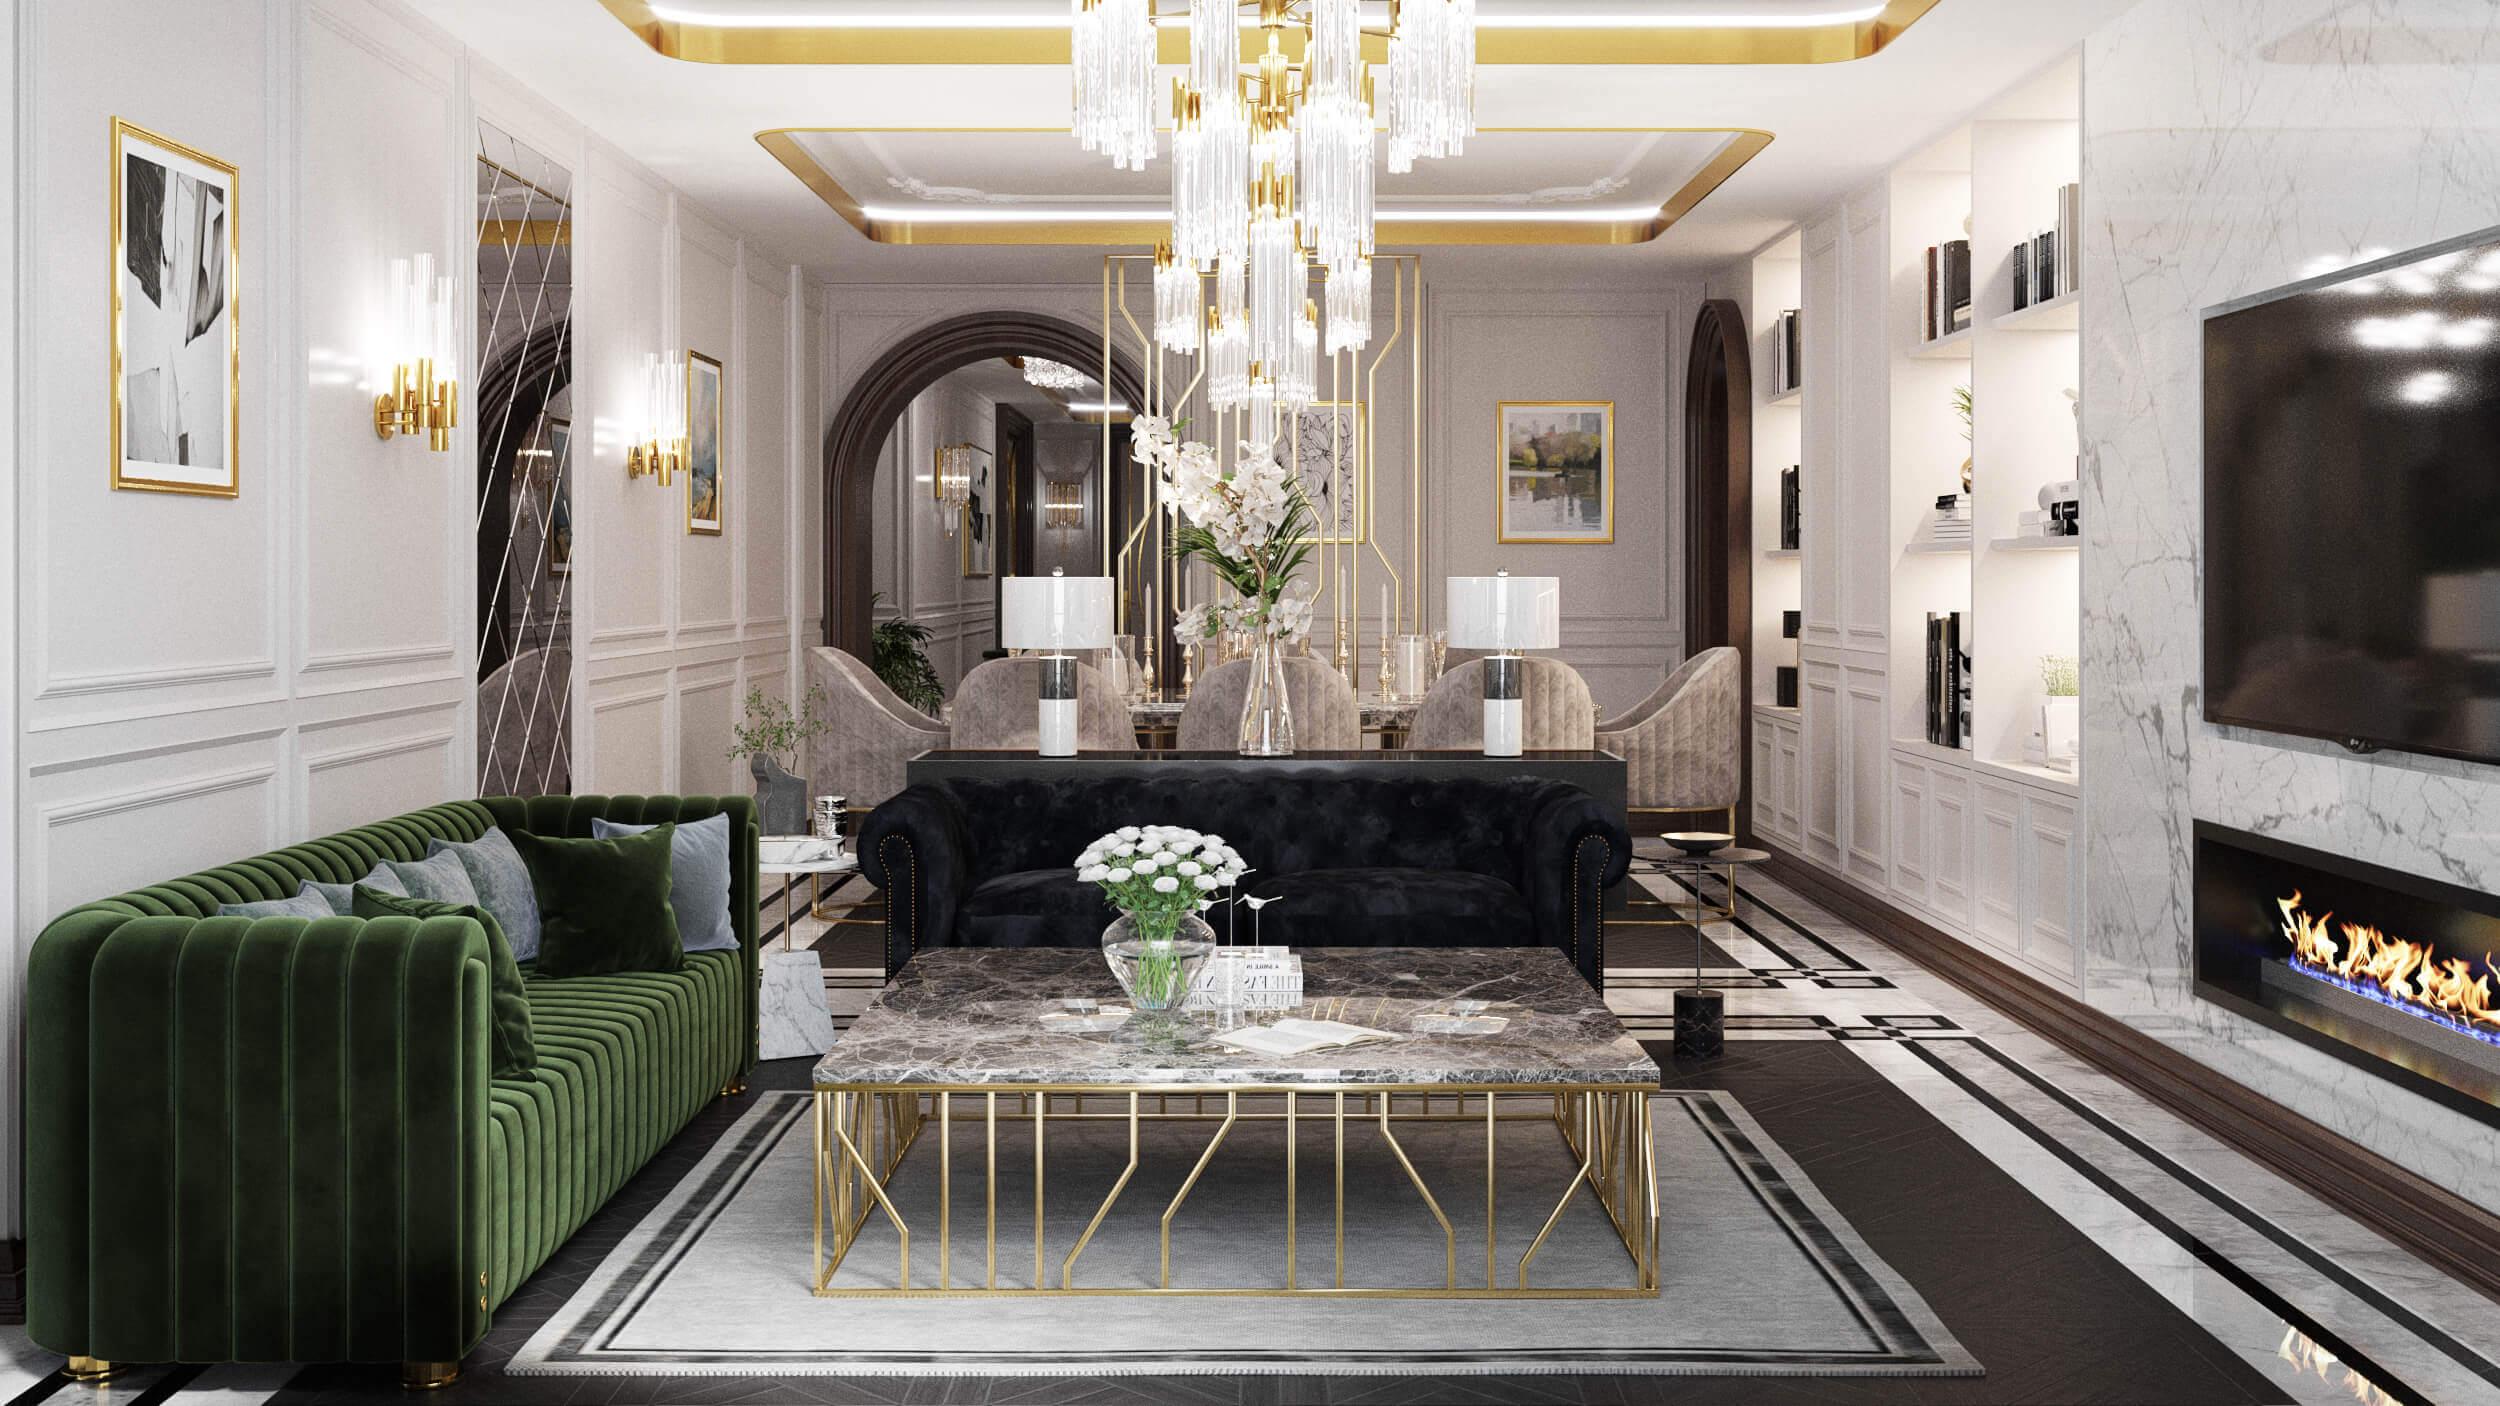 home inspiration 3858 IK Flat Residential